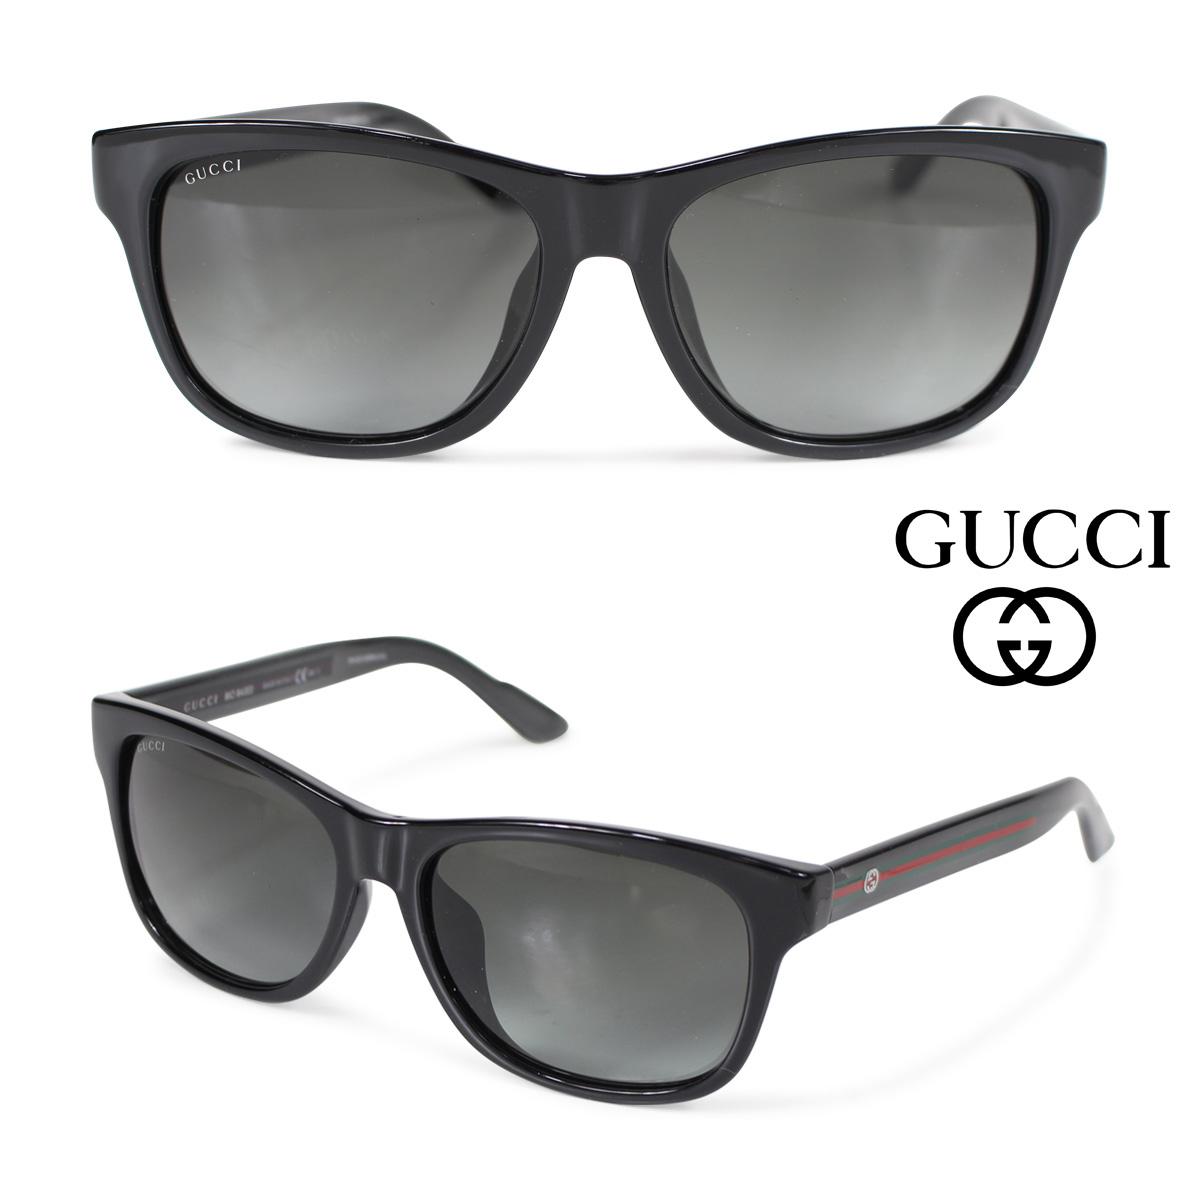 35e0b1a90d GUCCI Gucci sunglasses men gap Dis eyewear 3735FS IMXPT black black